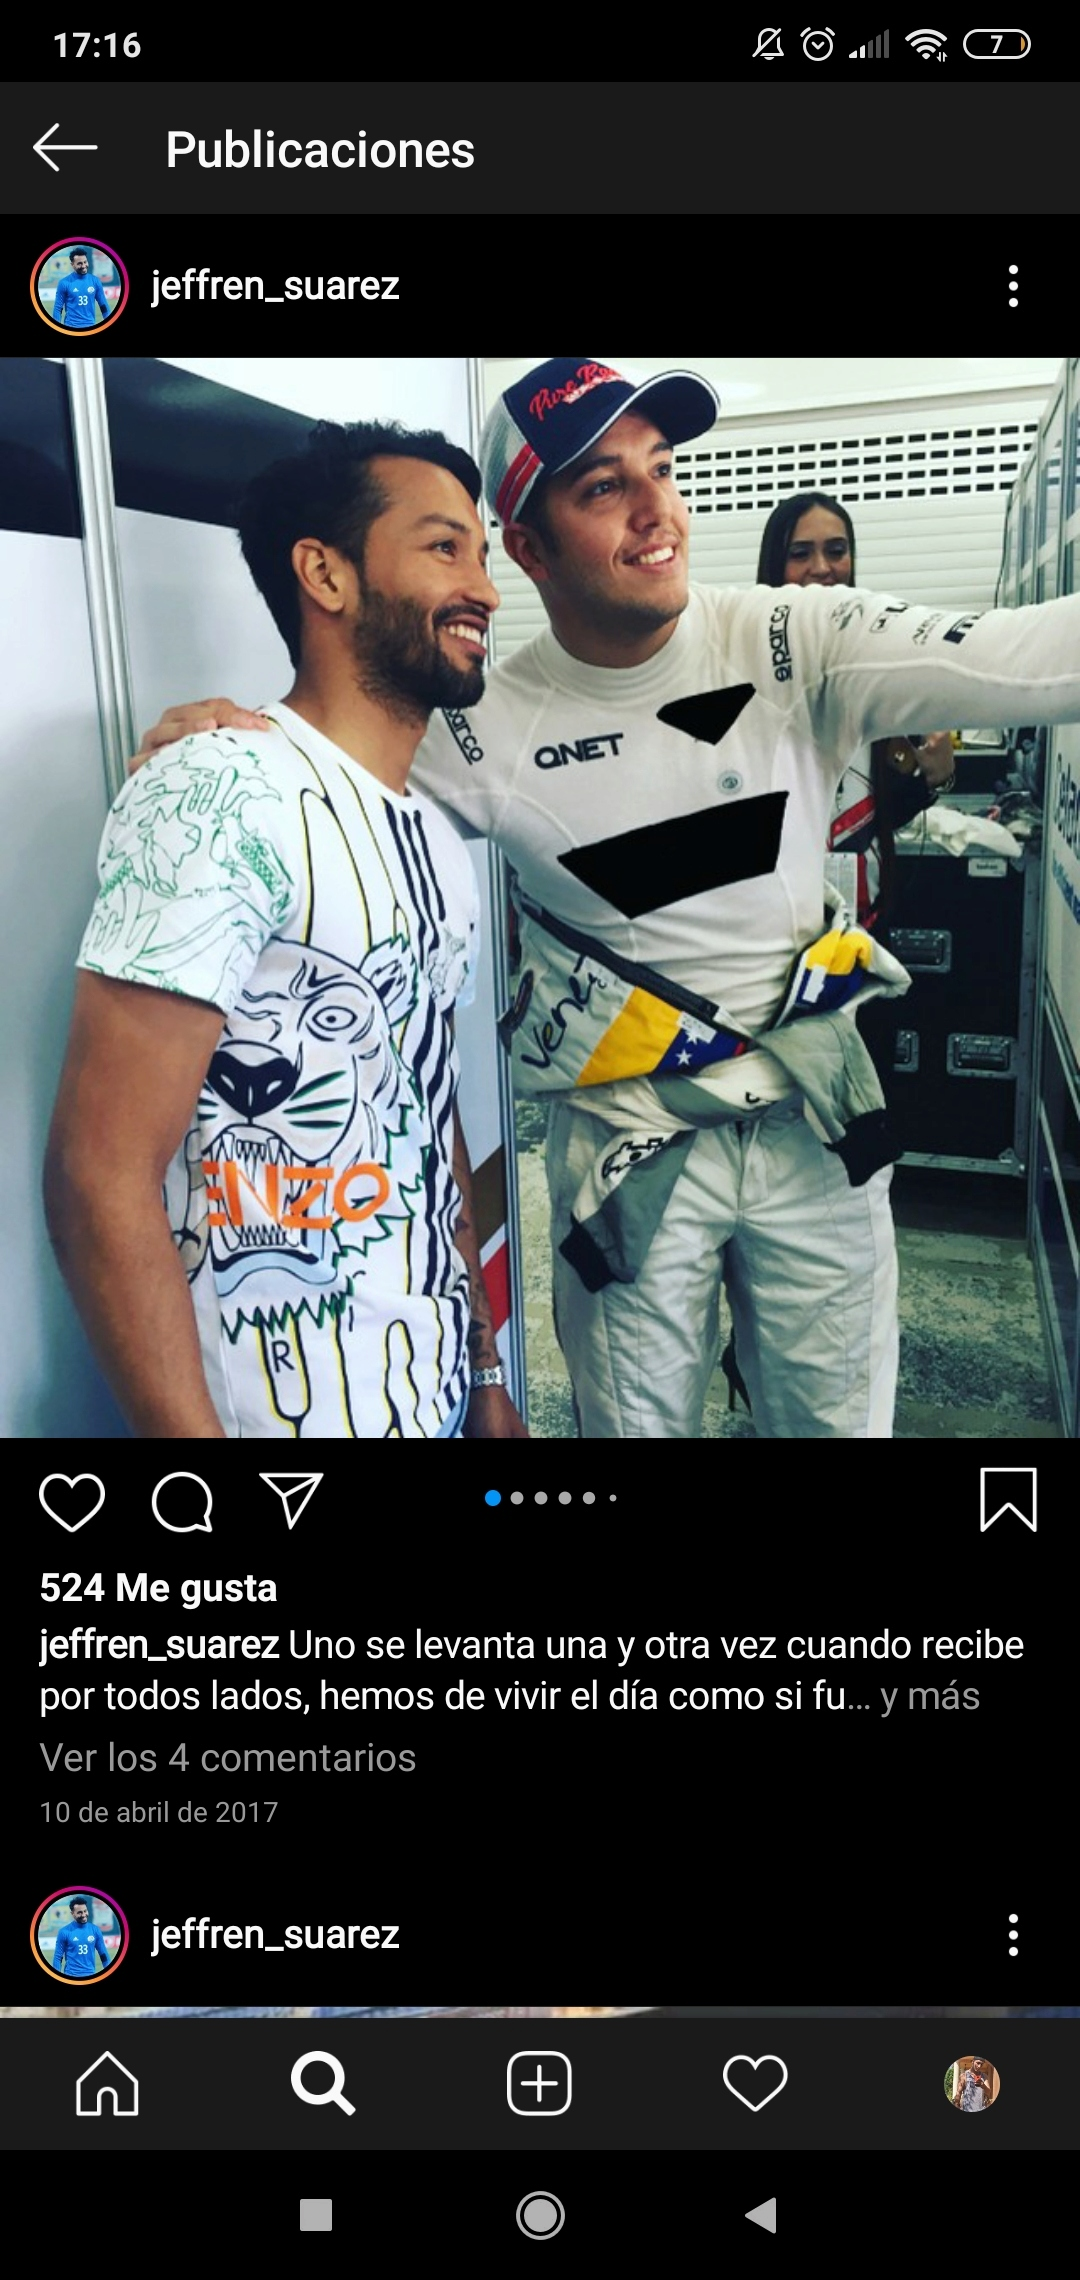 ¿Cuánto mide Jeffrén Suárez? Screen81